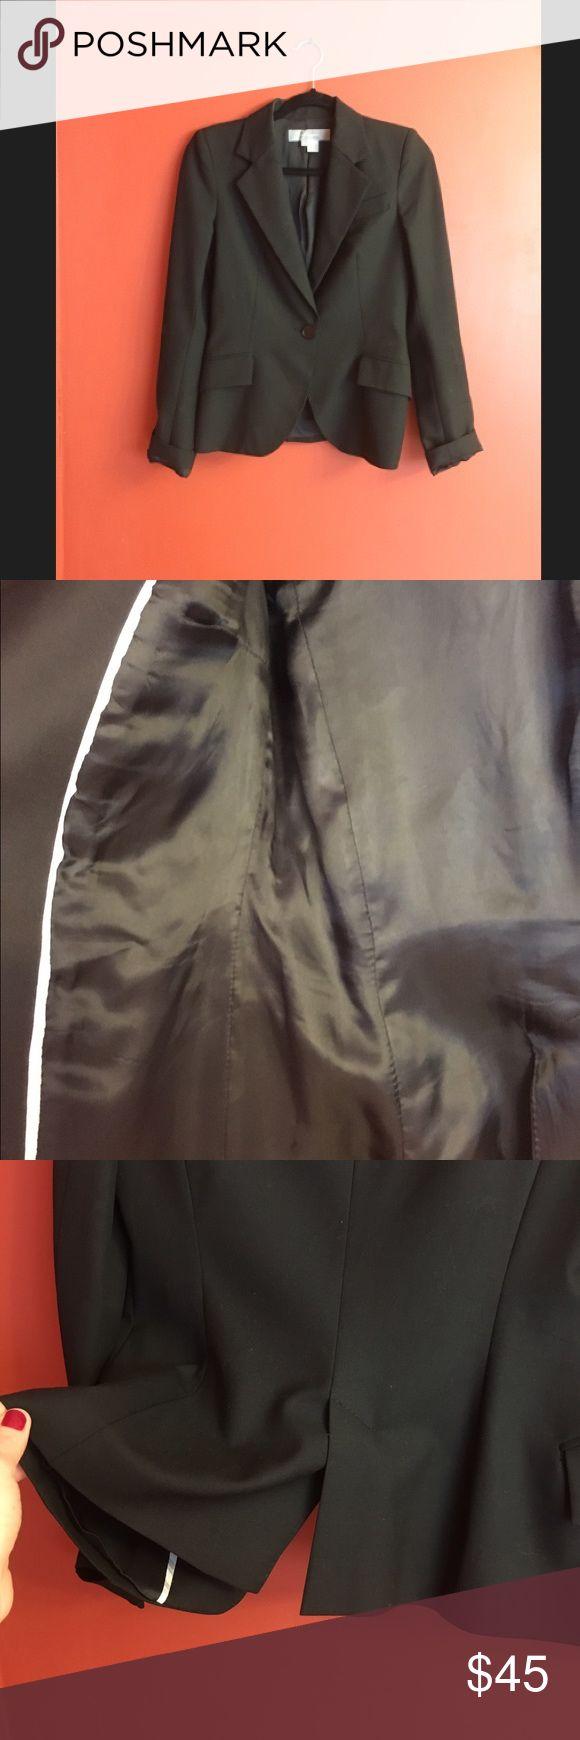 Black Womans Tuxedo Jacket Black Zara Woman Tuxedo Jacket-has some shoulder padding Zara Jackets & Coats Blazers